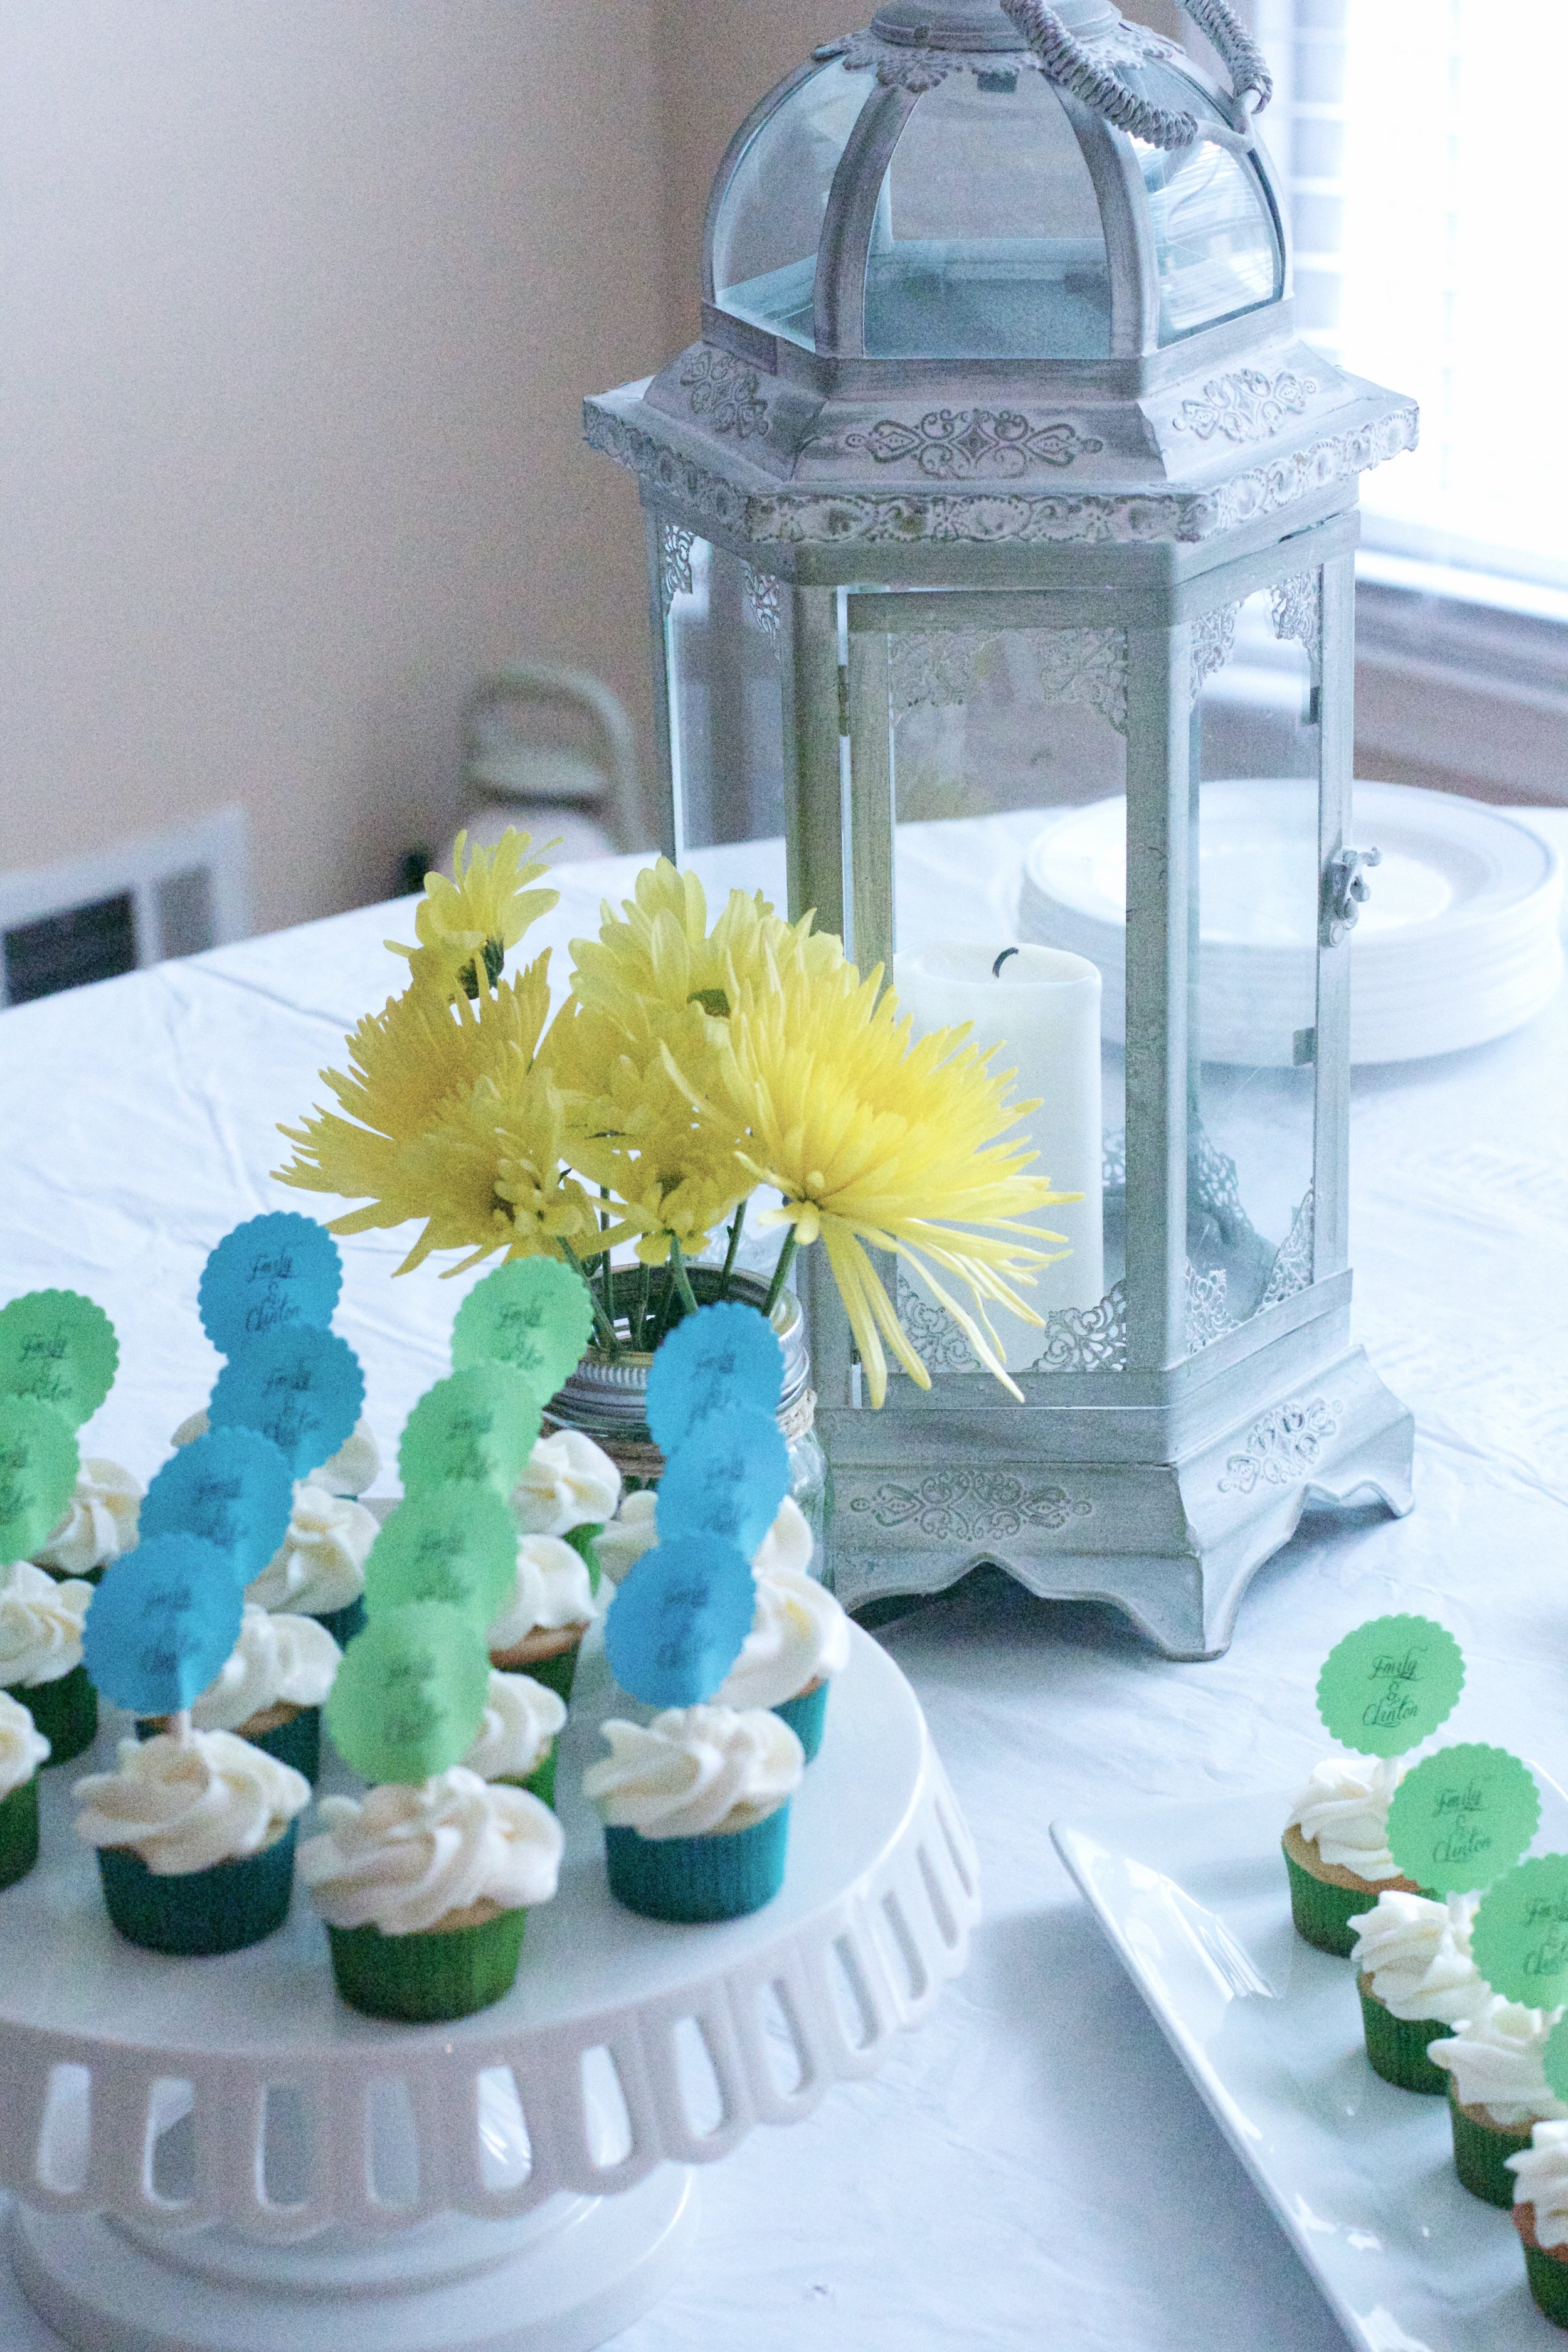 cupcake-minis-display